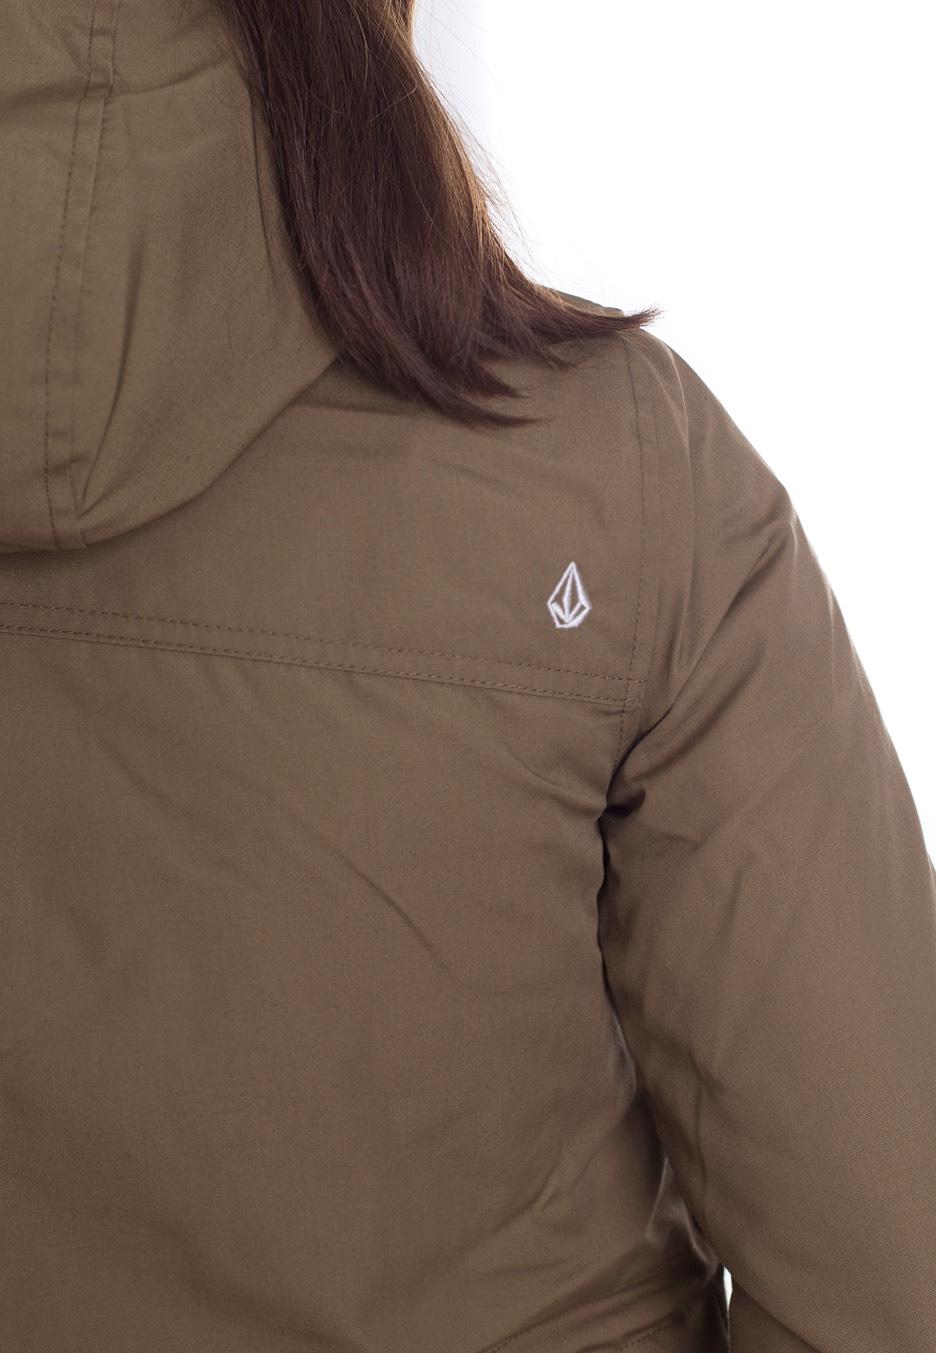 Venson Boutique Fr Volcom Streetwear Veste Olive apv7q0